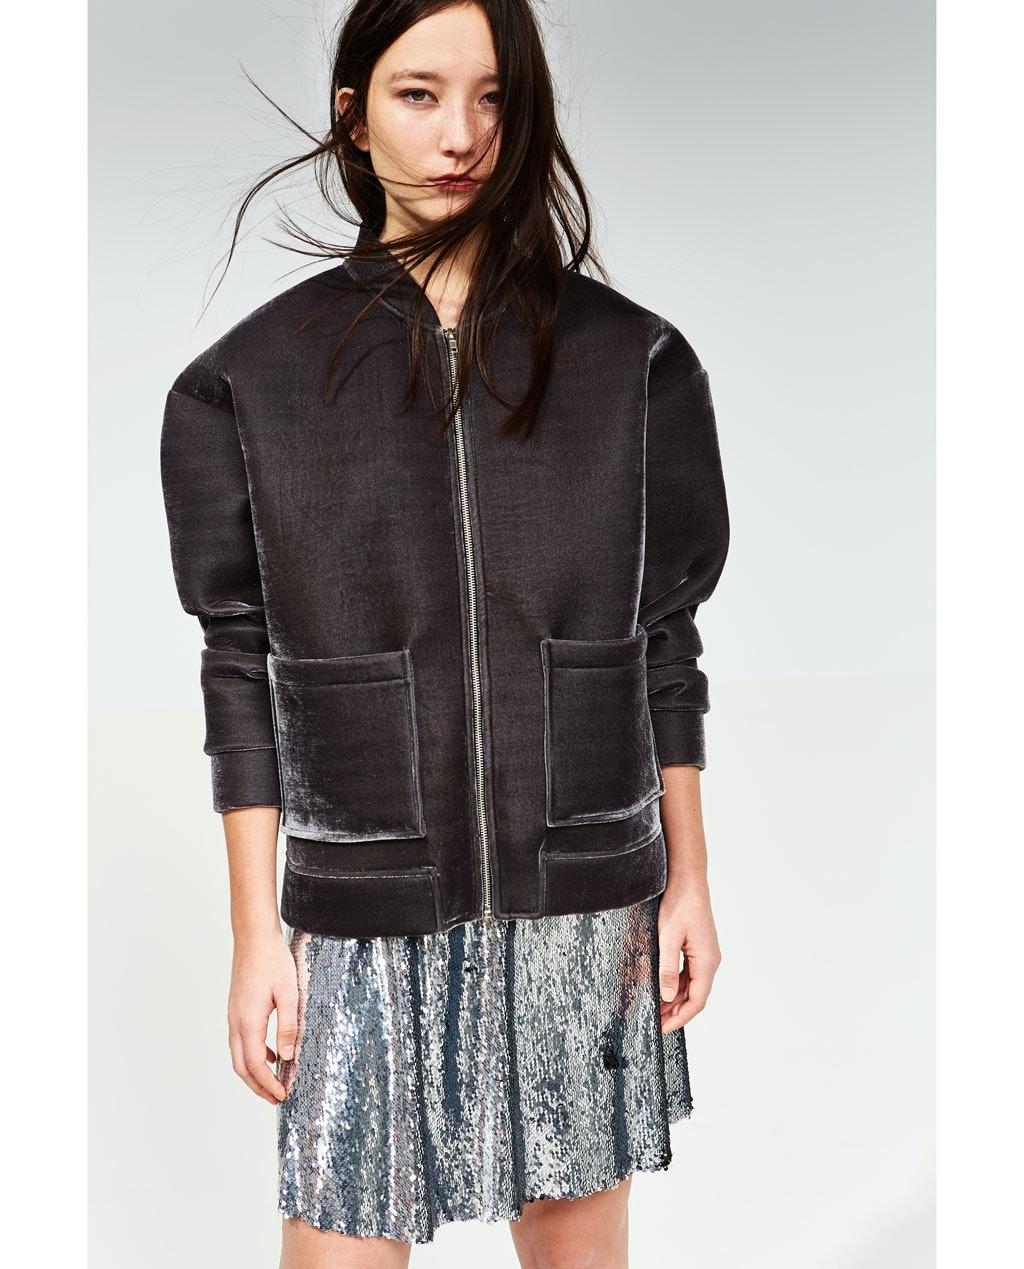 61389d45e28 13 Zara Items Every Fashion Girl Owns